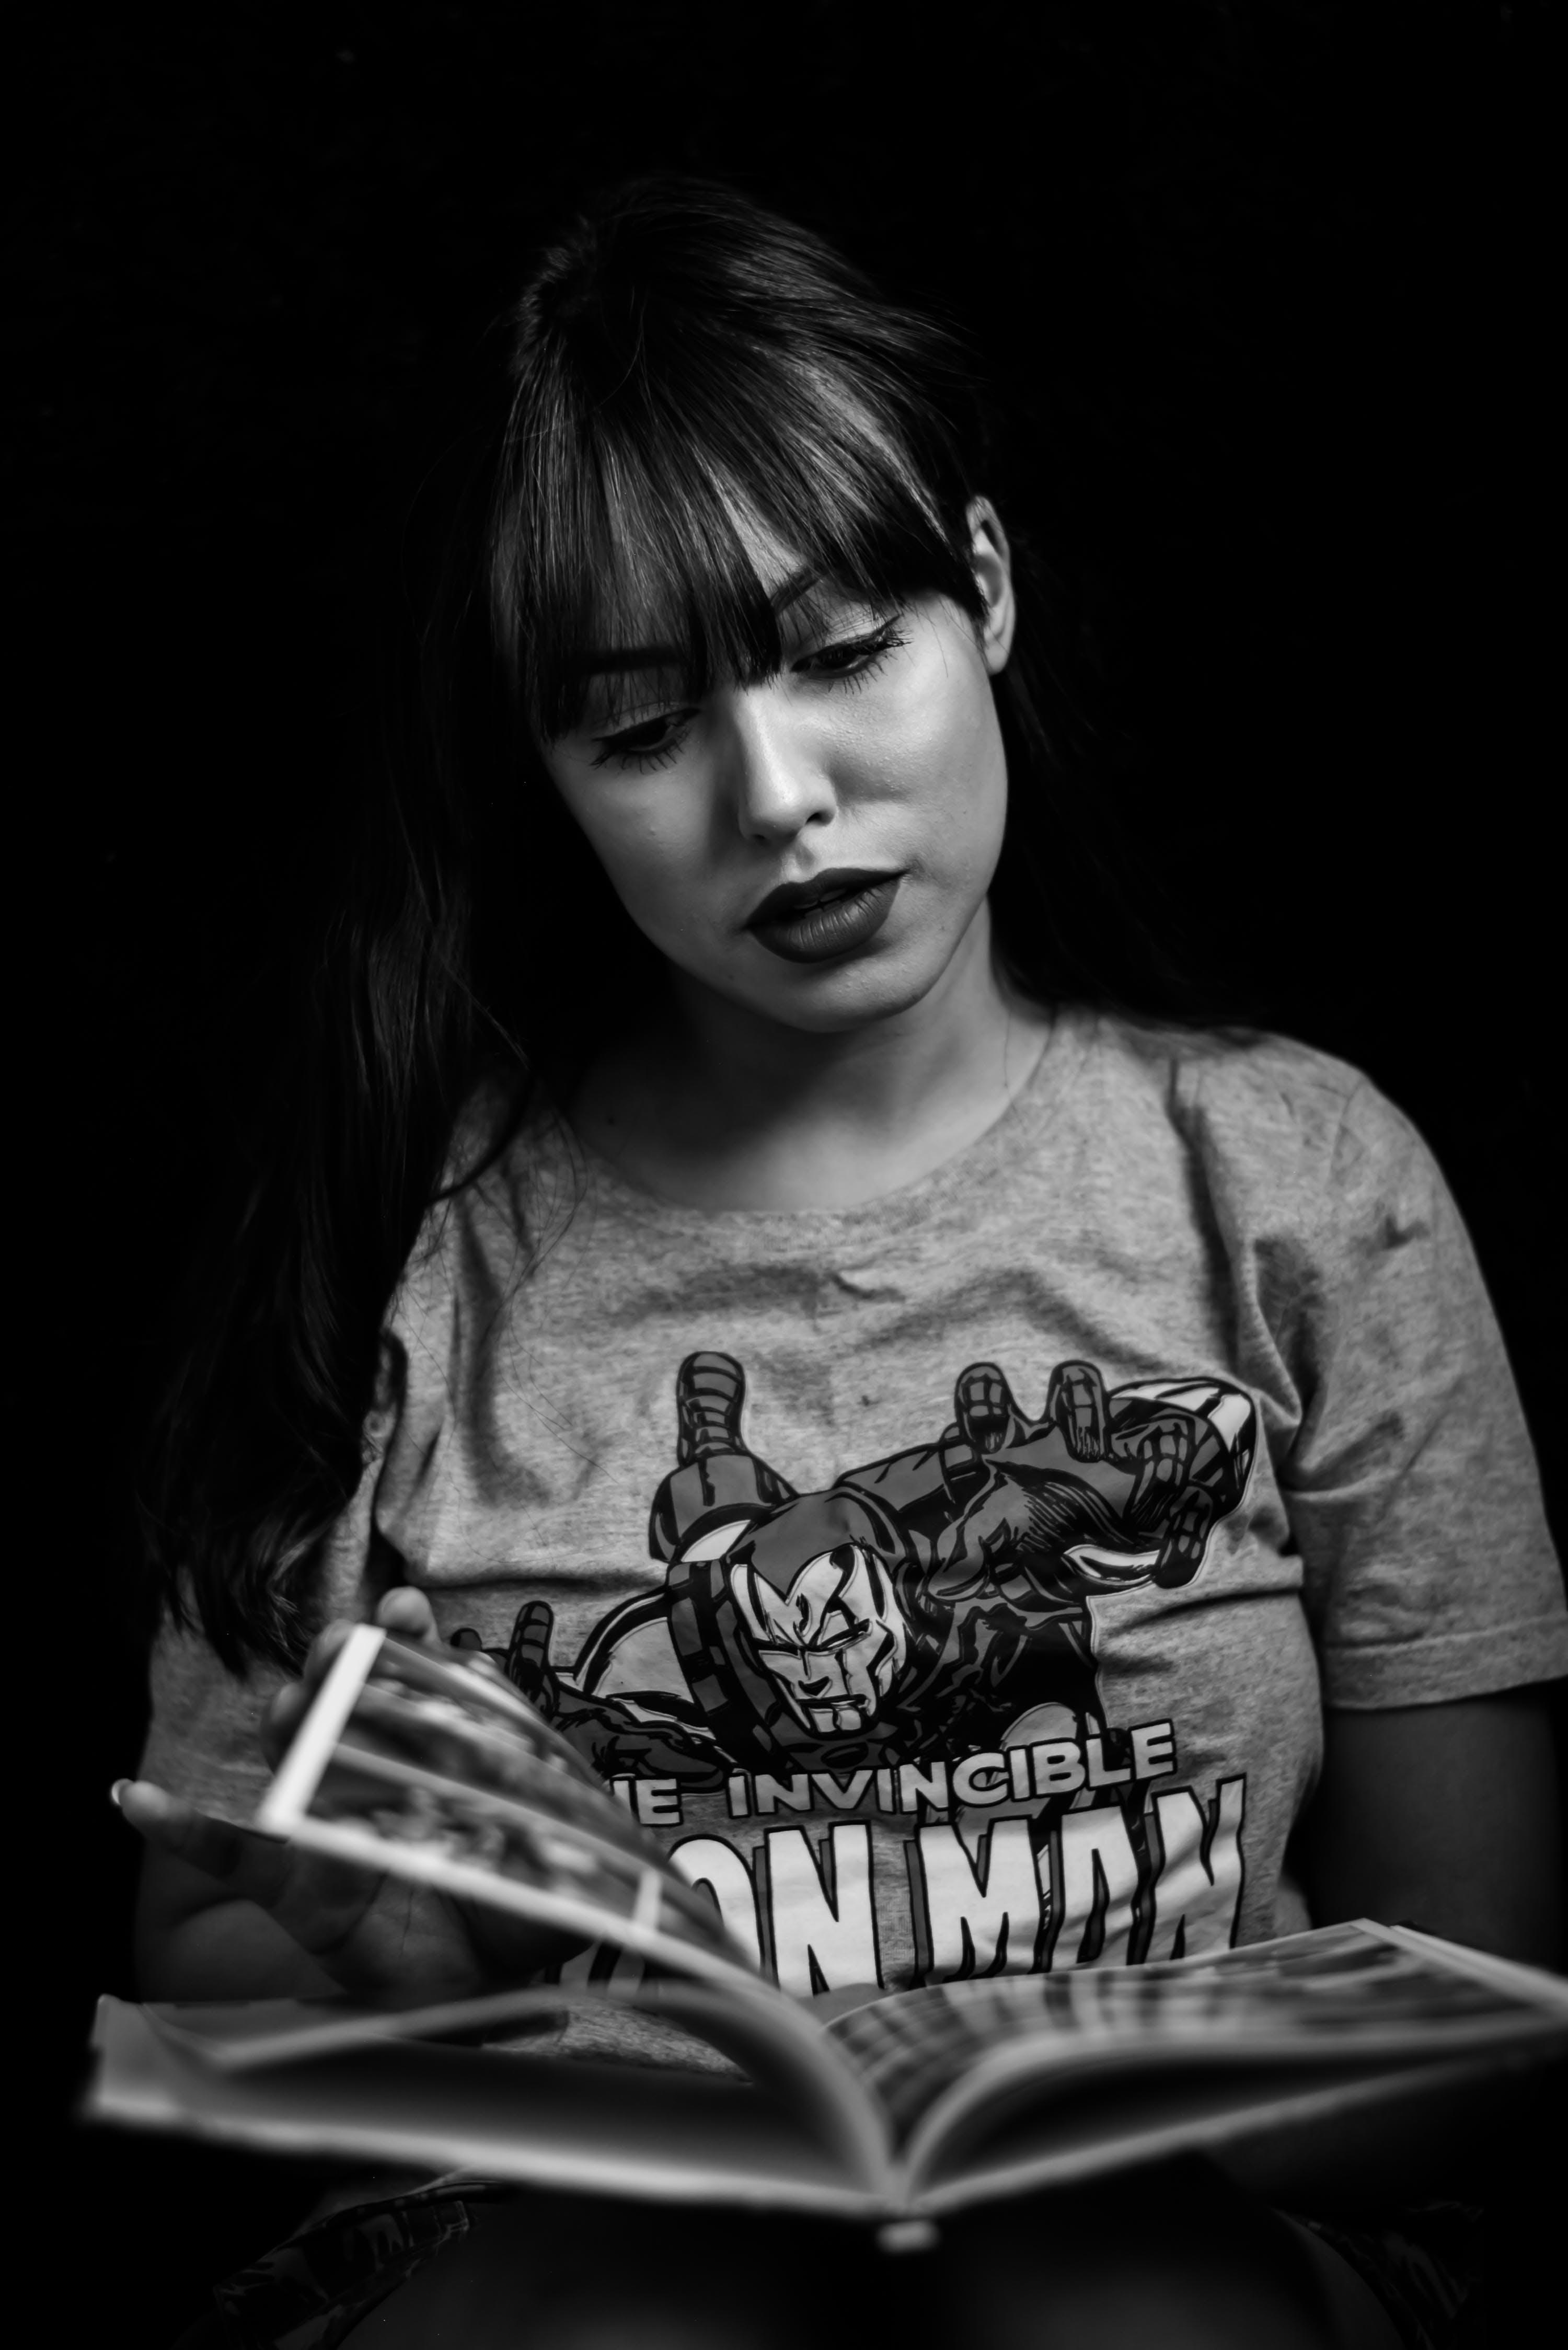 Monochrome Photography of Woman Reading Magazine